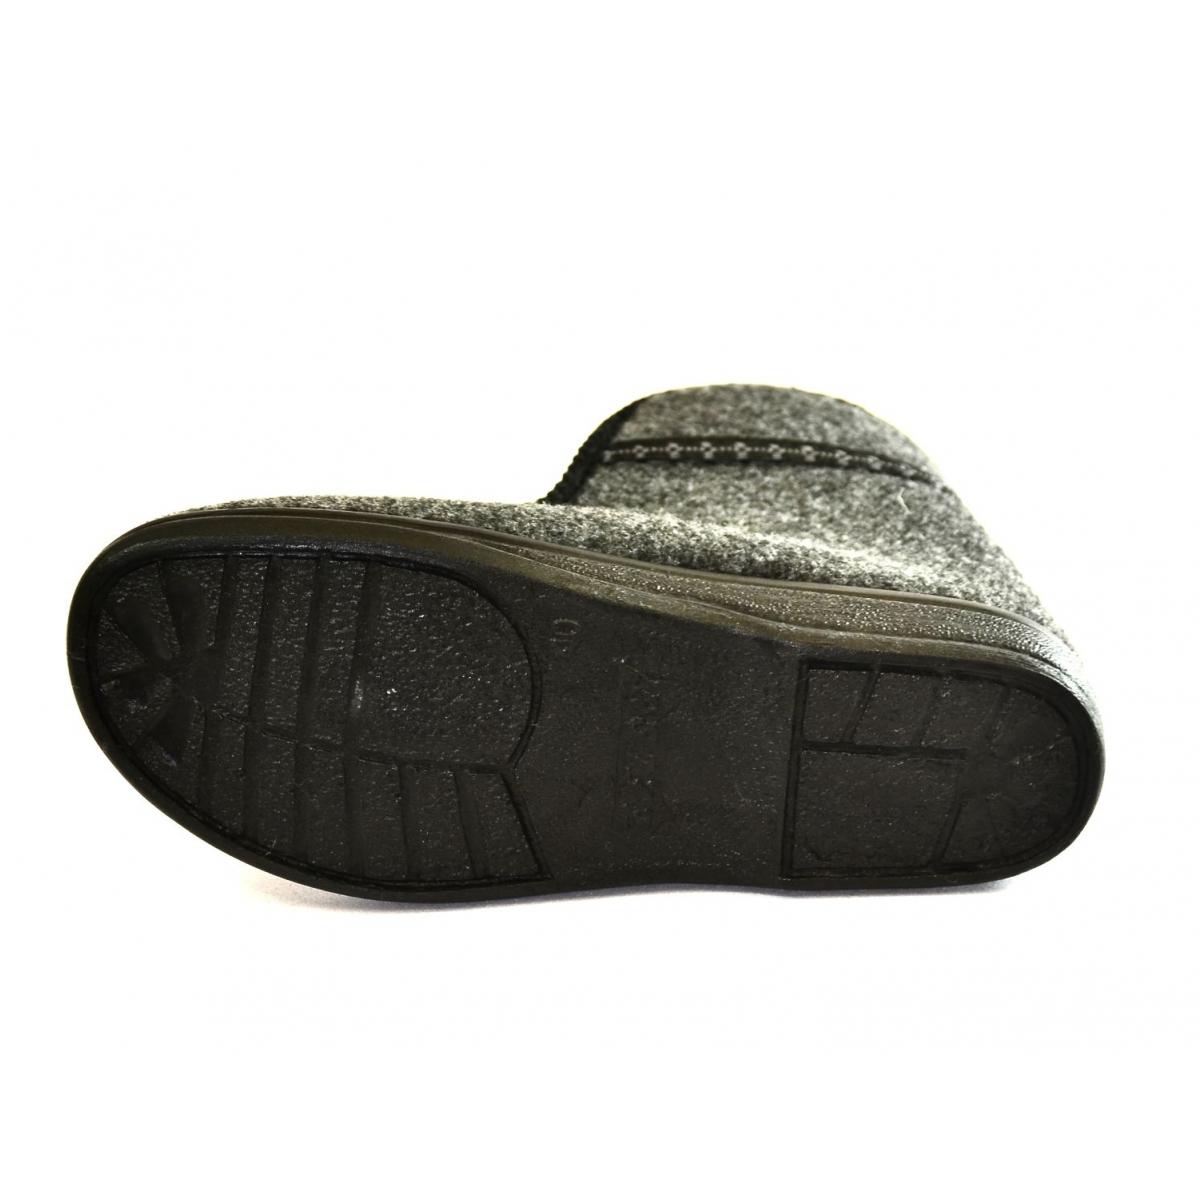 9991682ef3ee Pánske sivé papuče TEO - 4